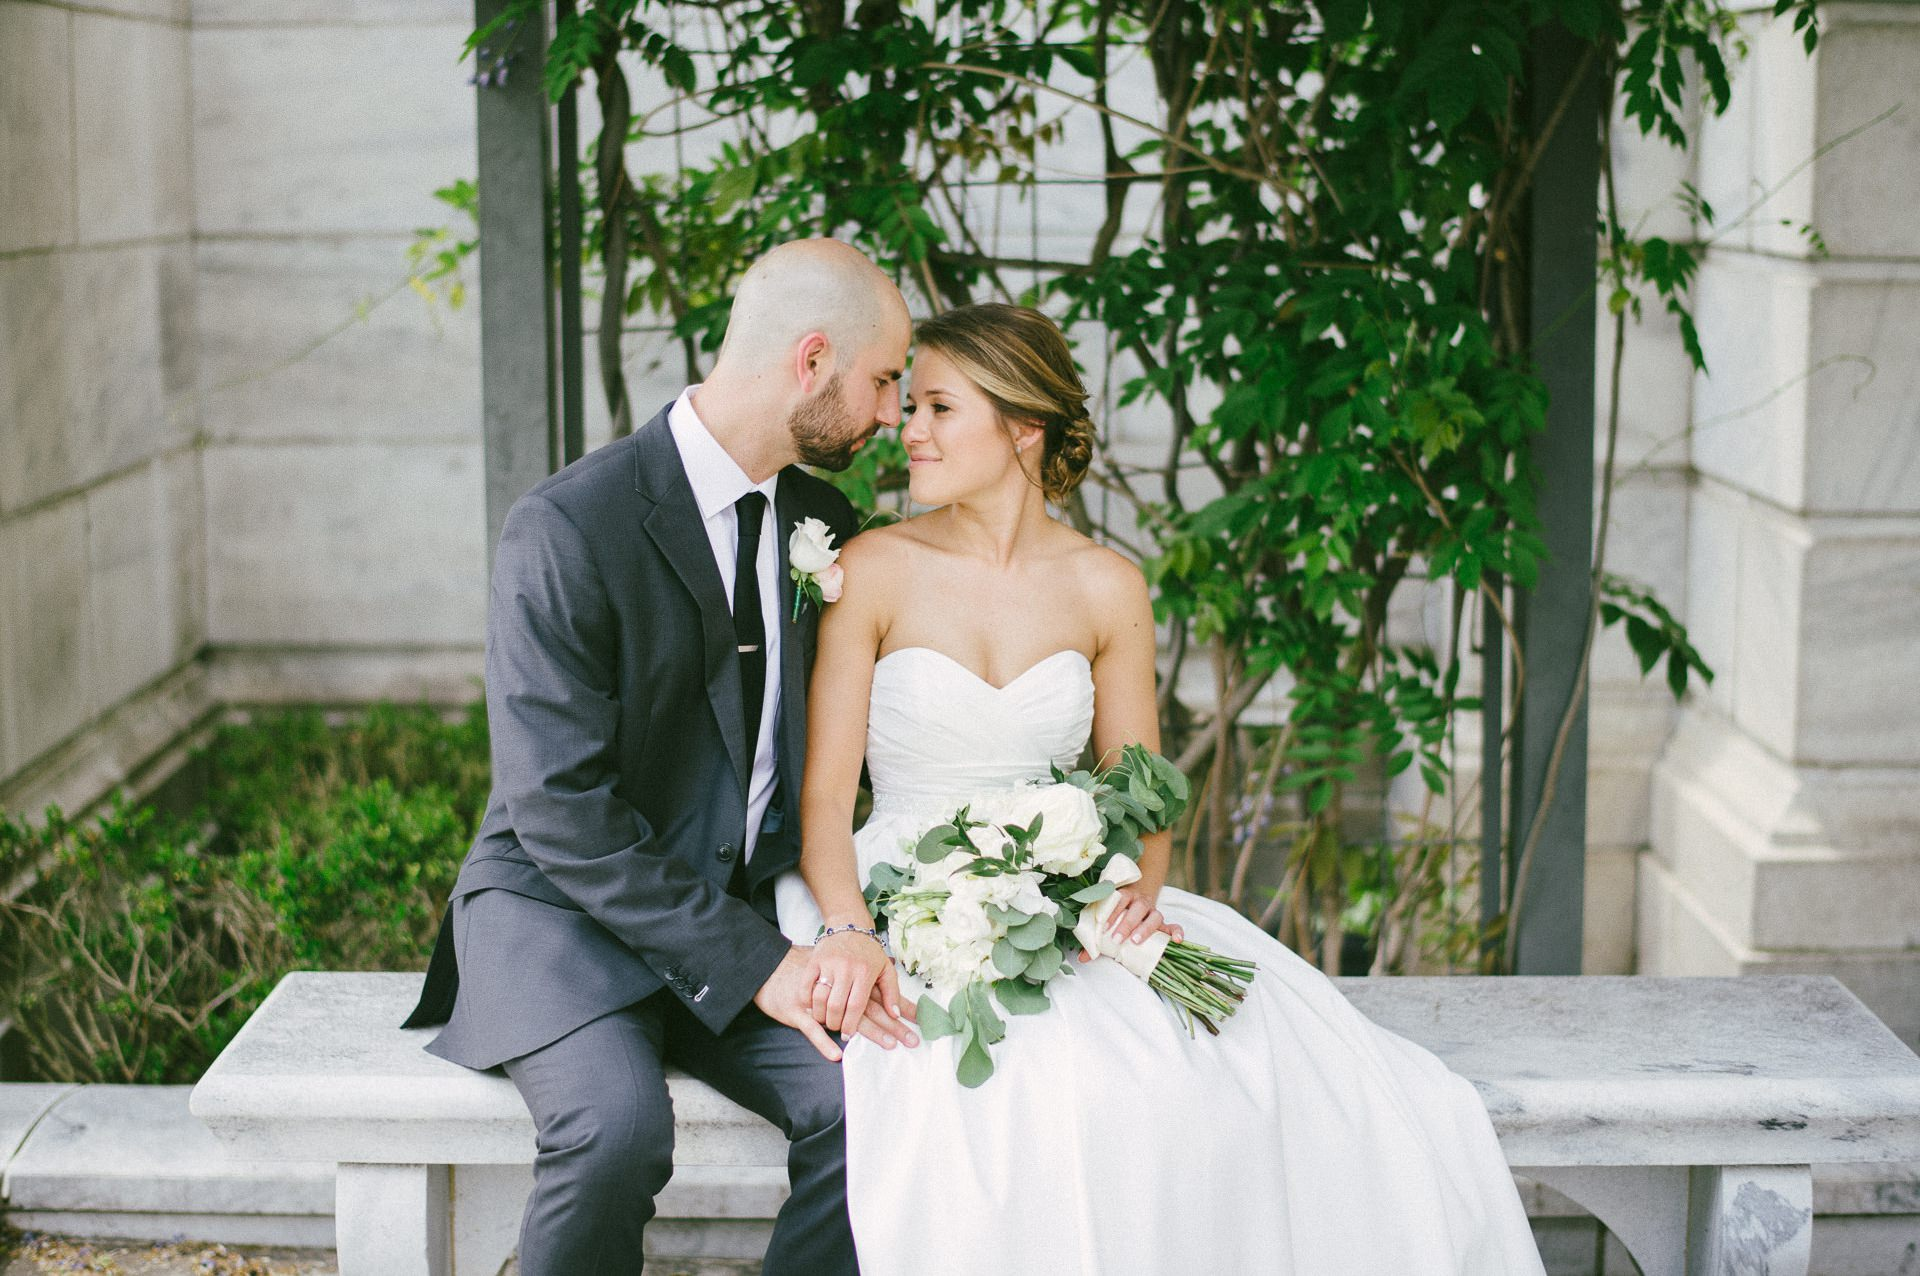 Dowtown Hilton Cleveland Wedding Photographer 1 44.jpg